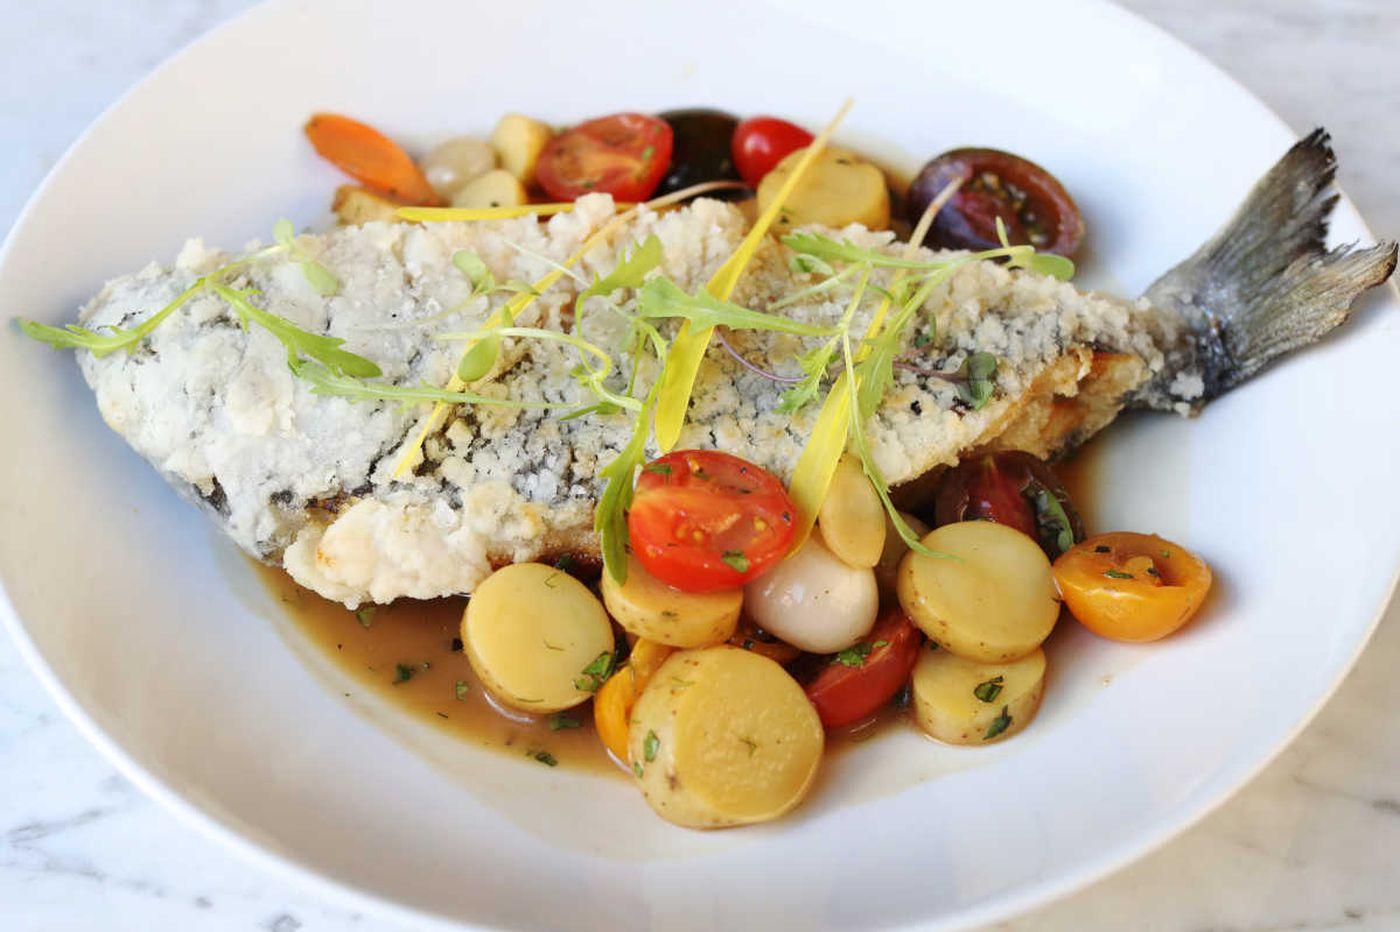 Chef Sylva Senat finally finds a home at Maison 208